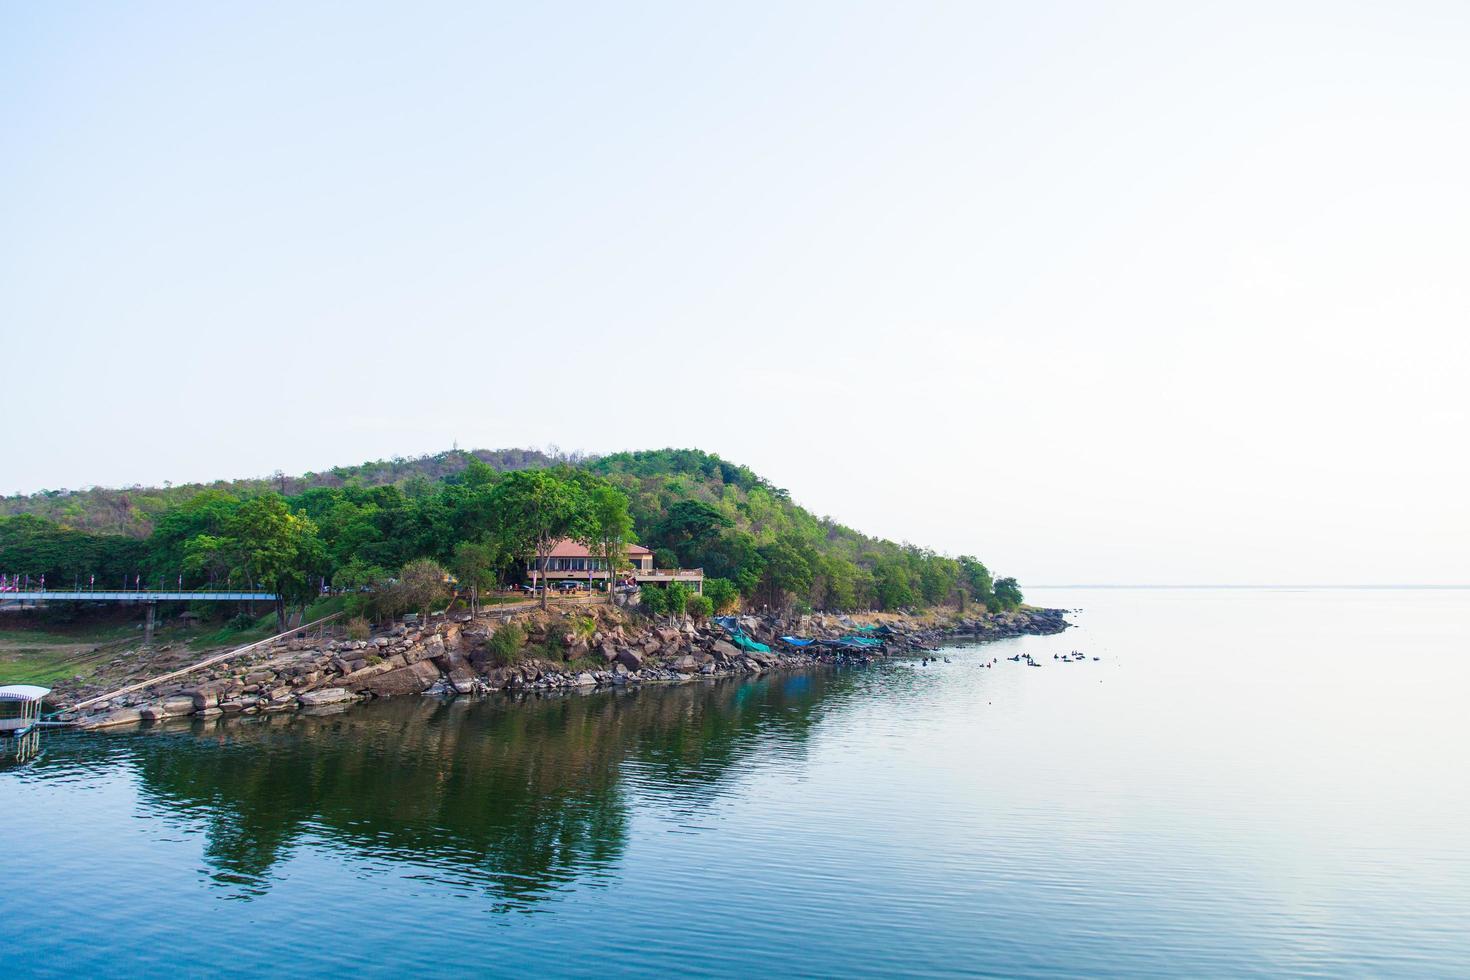 lago en tailandia foto